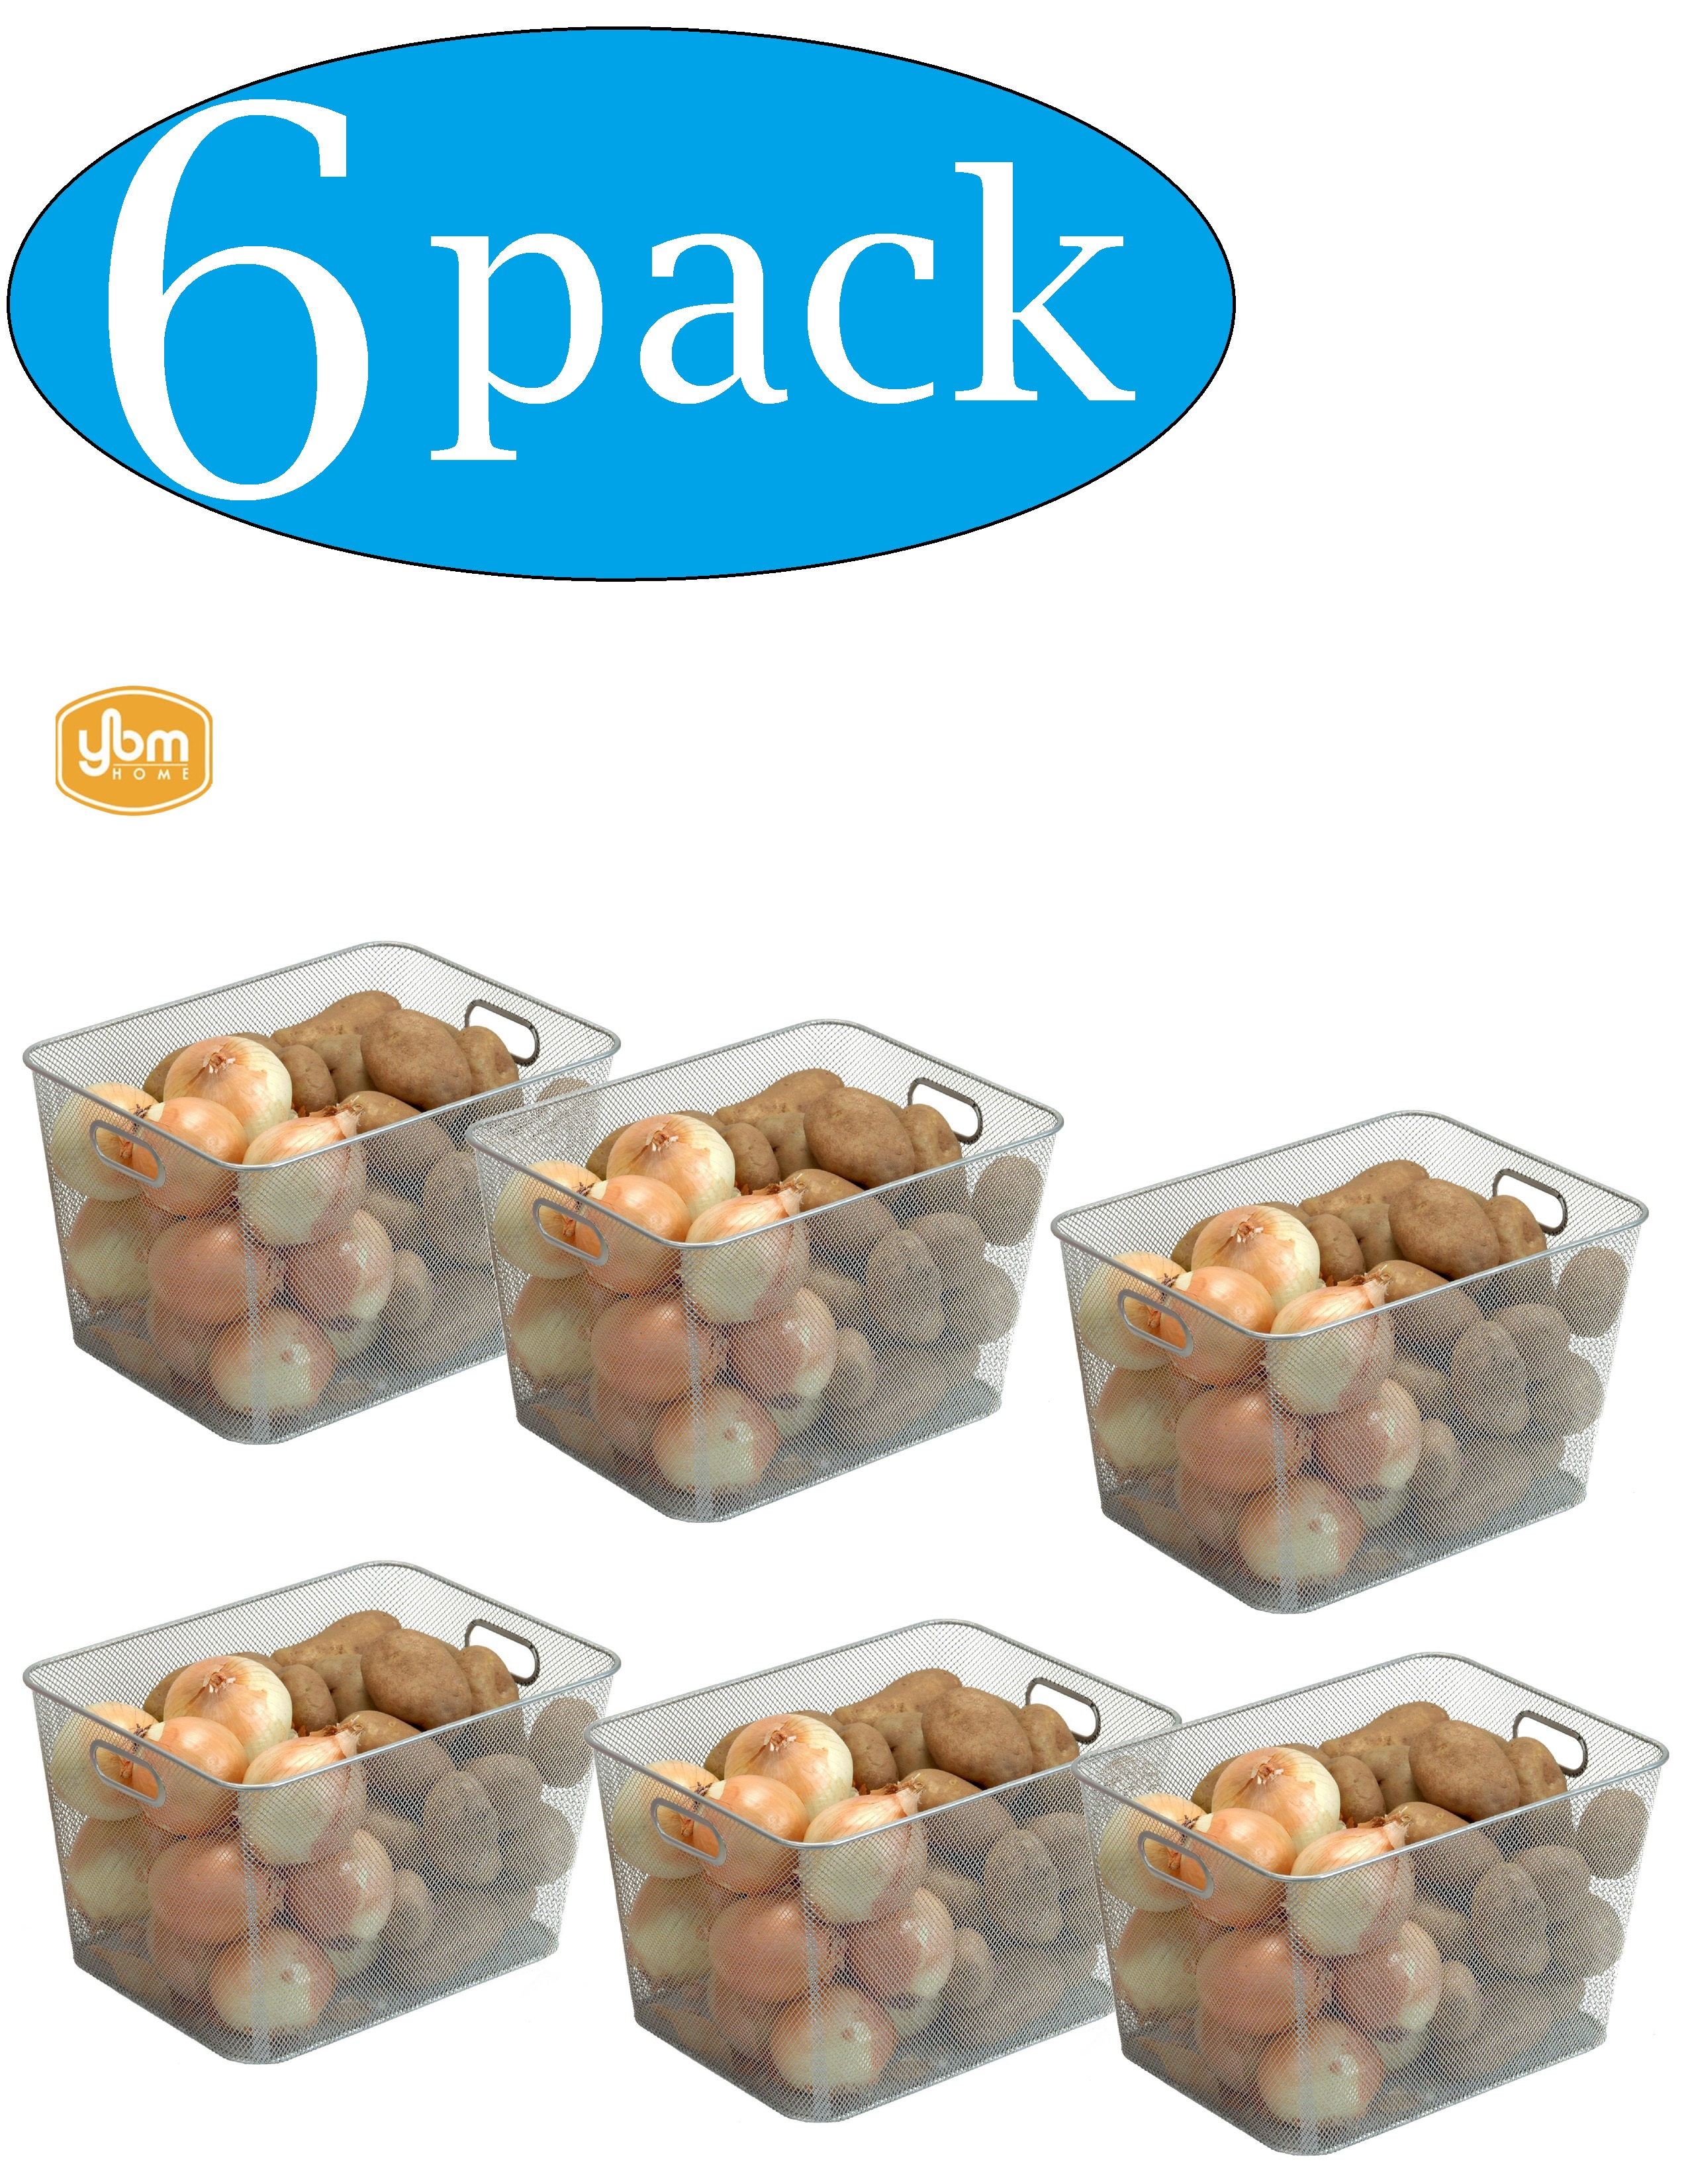 W x 8.8 in H 6 Pack L x 10 in Ybm Home Wire Mesh Open Bin Basket Black 14 in